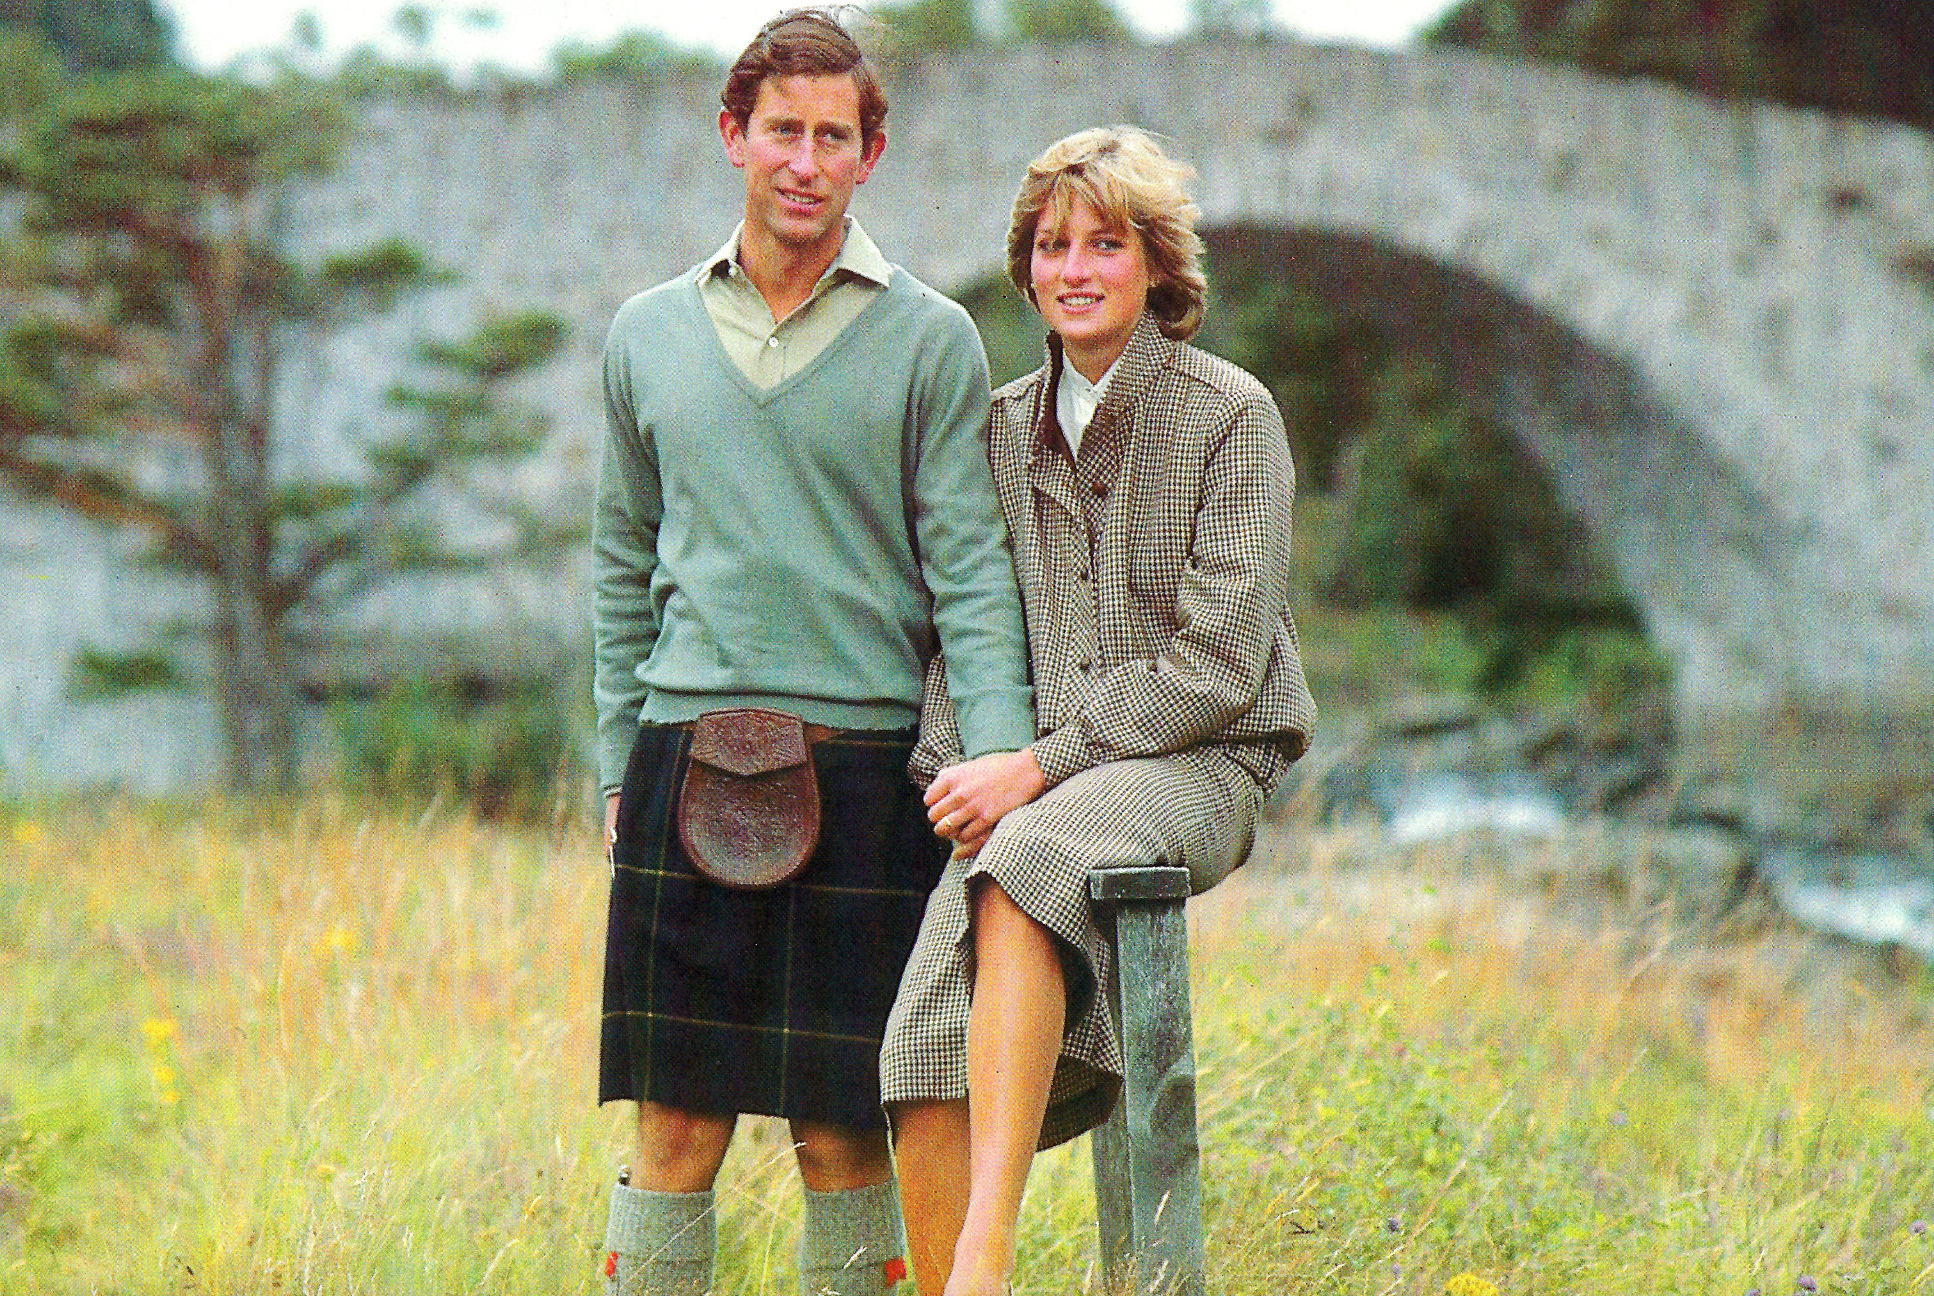 Screenshot 2021 06 03 at 15.34.53 Princess Diana's Most Iconic Outfits